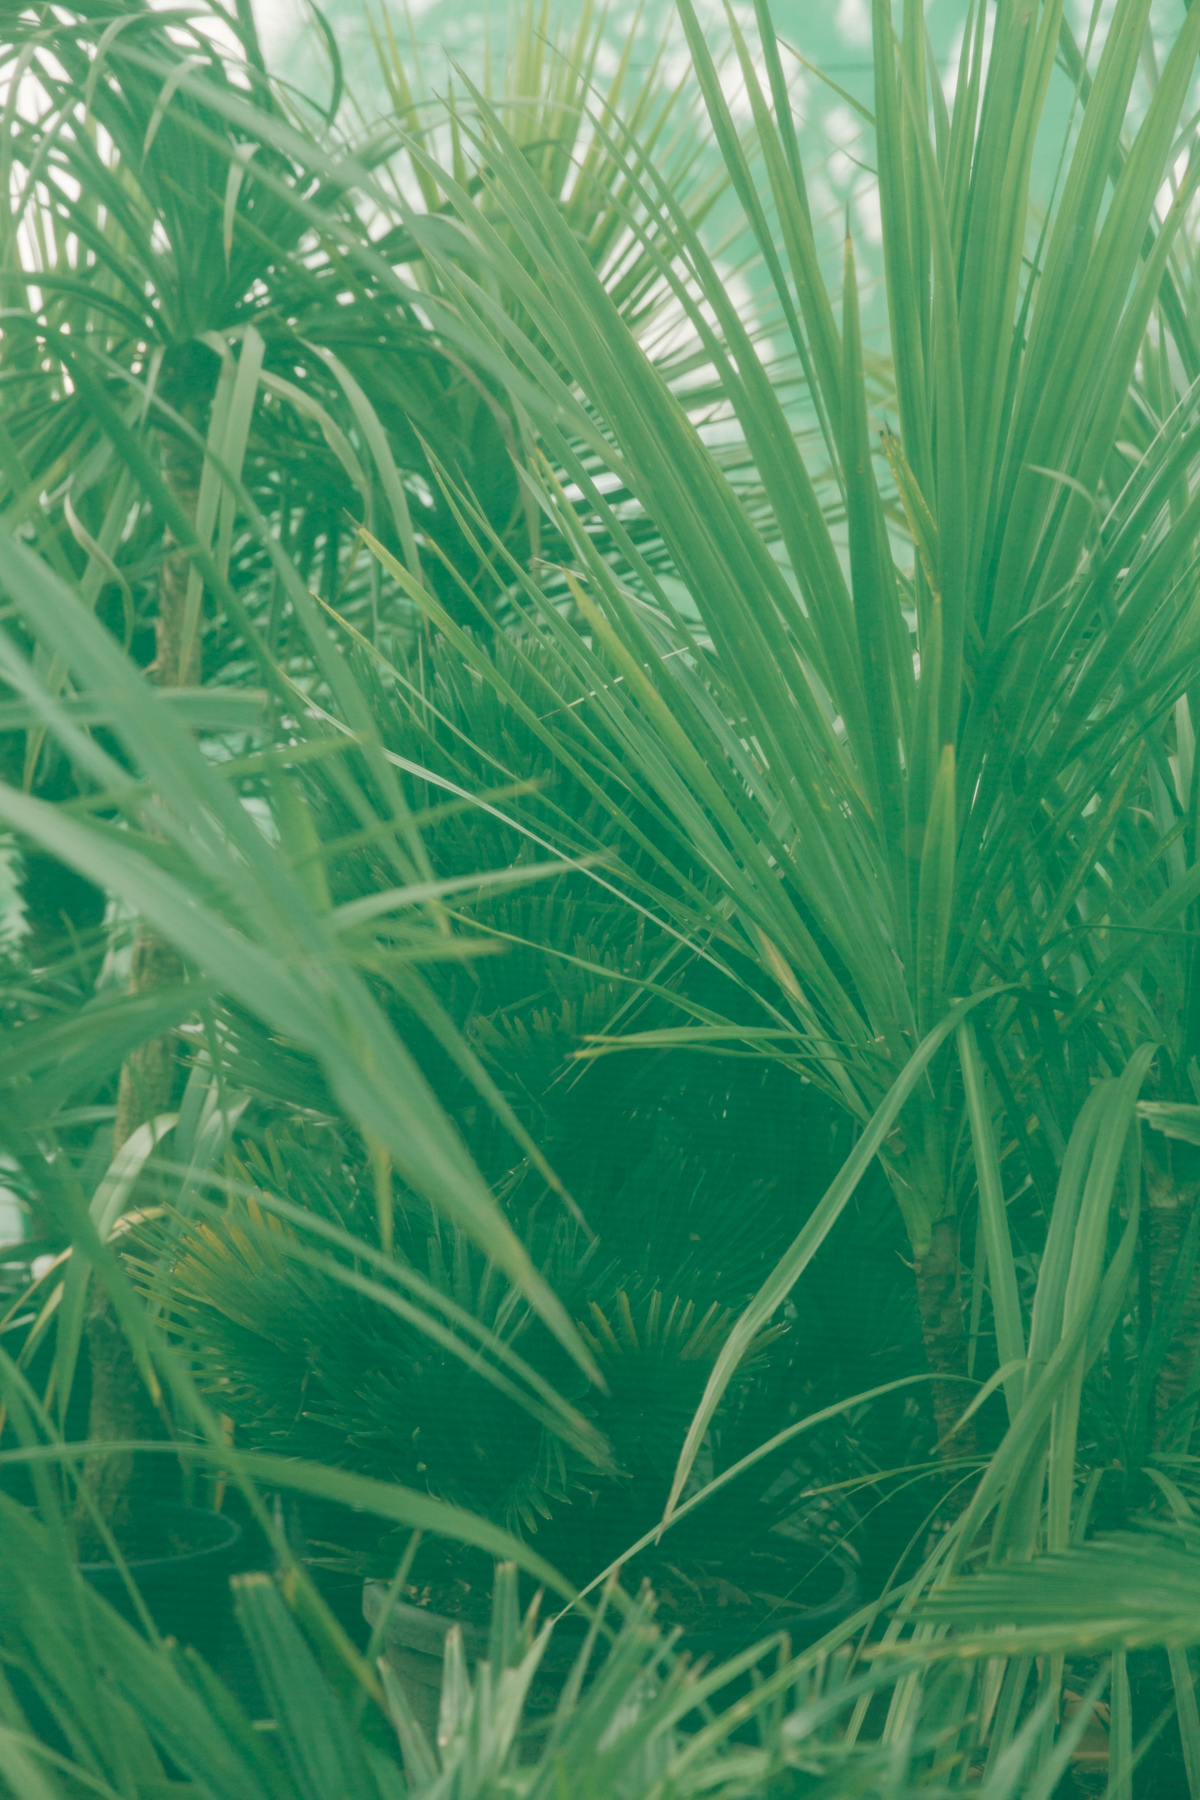 Exploring the plants at Urban Jungle near Norwich.